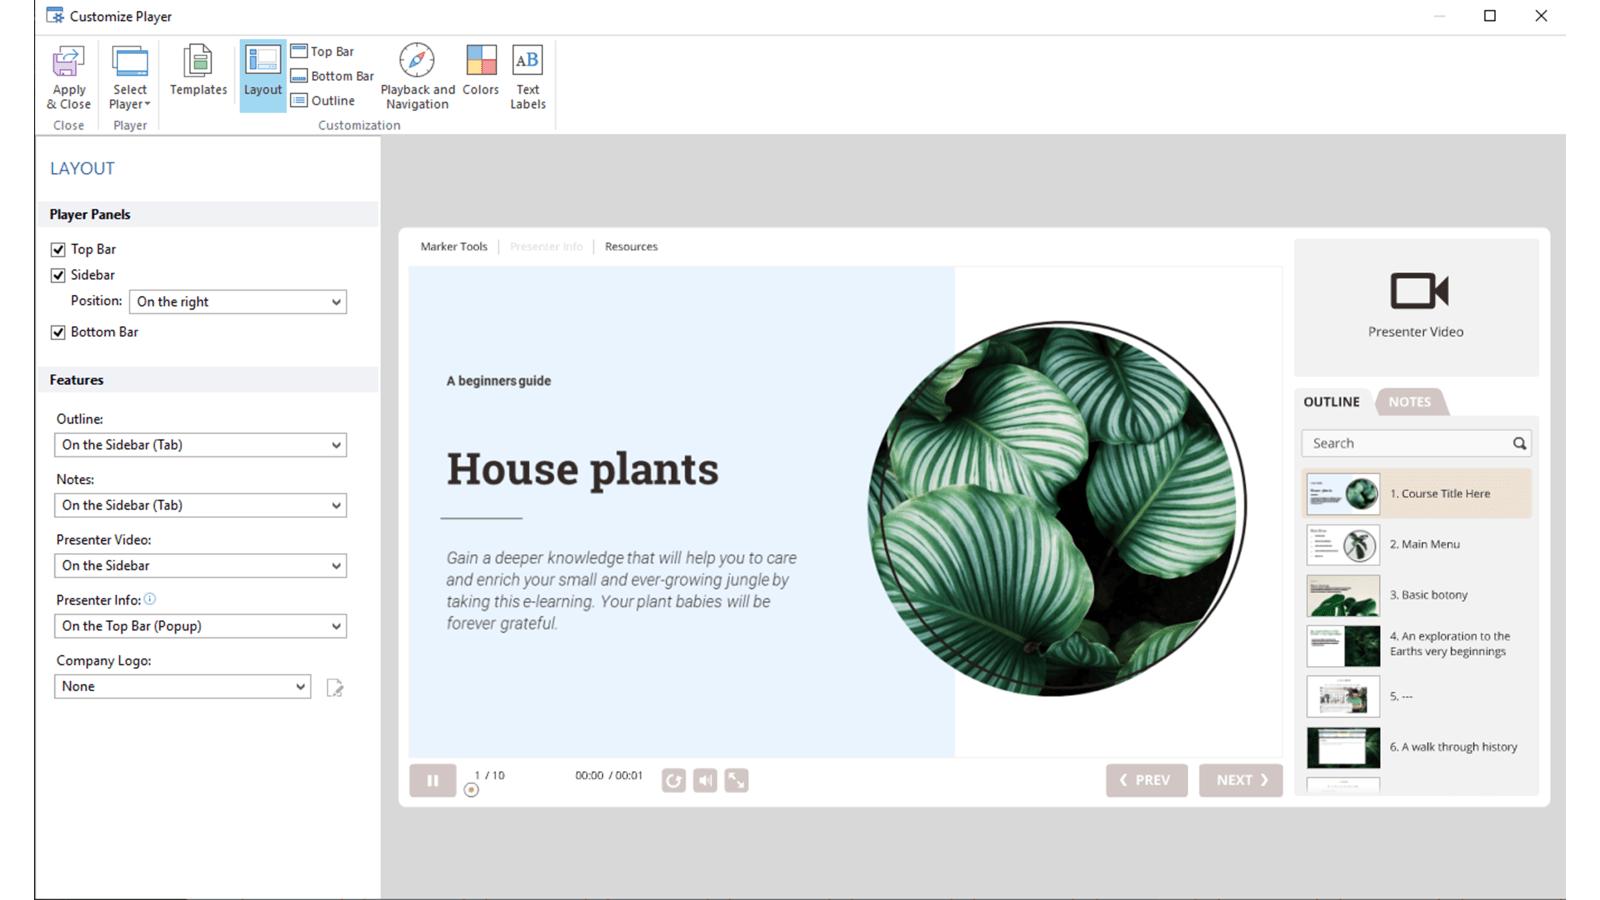 Screenshot of iSprings Customize Player window